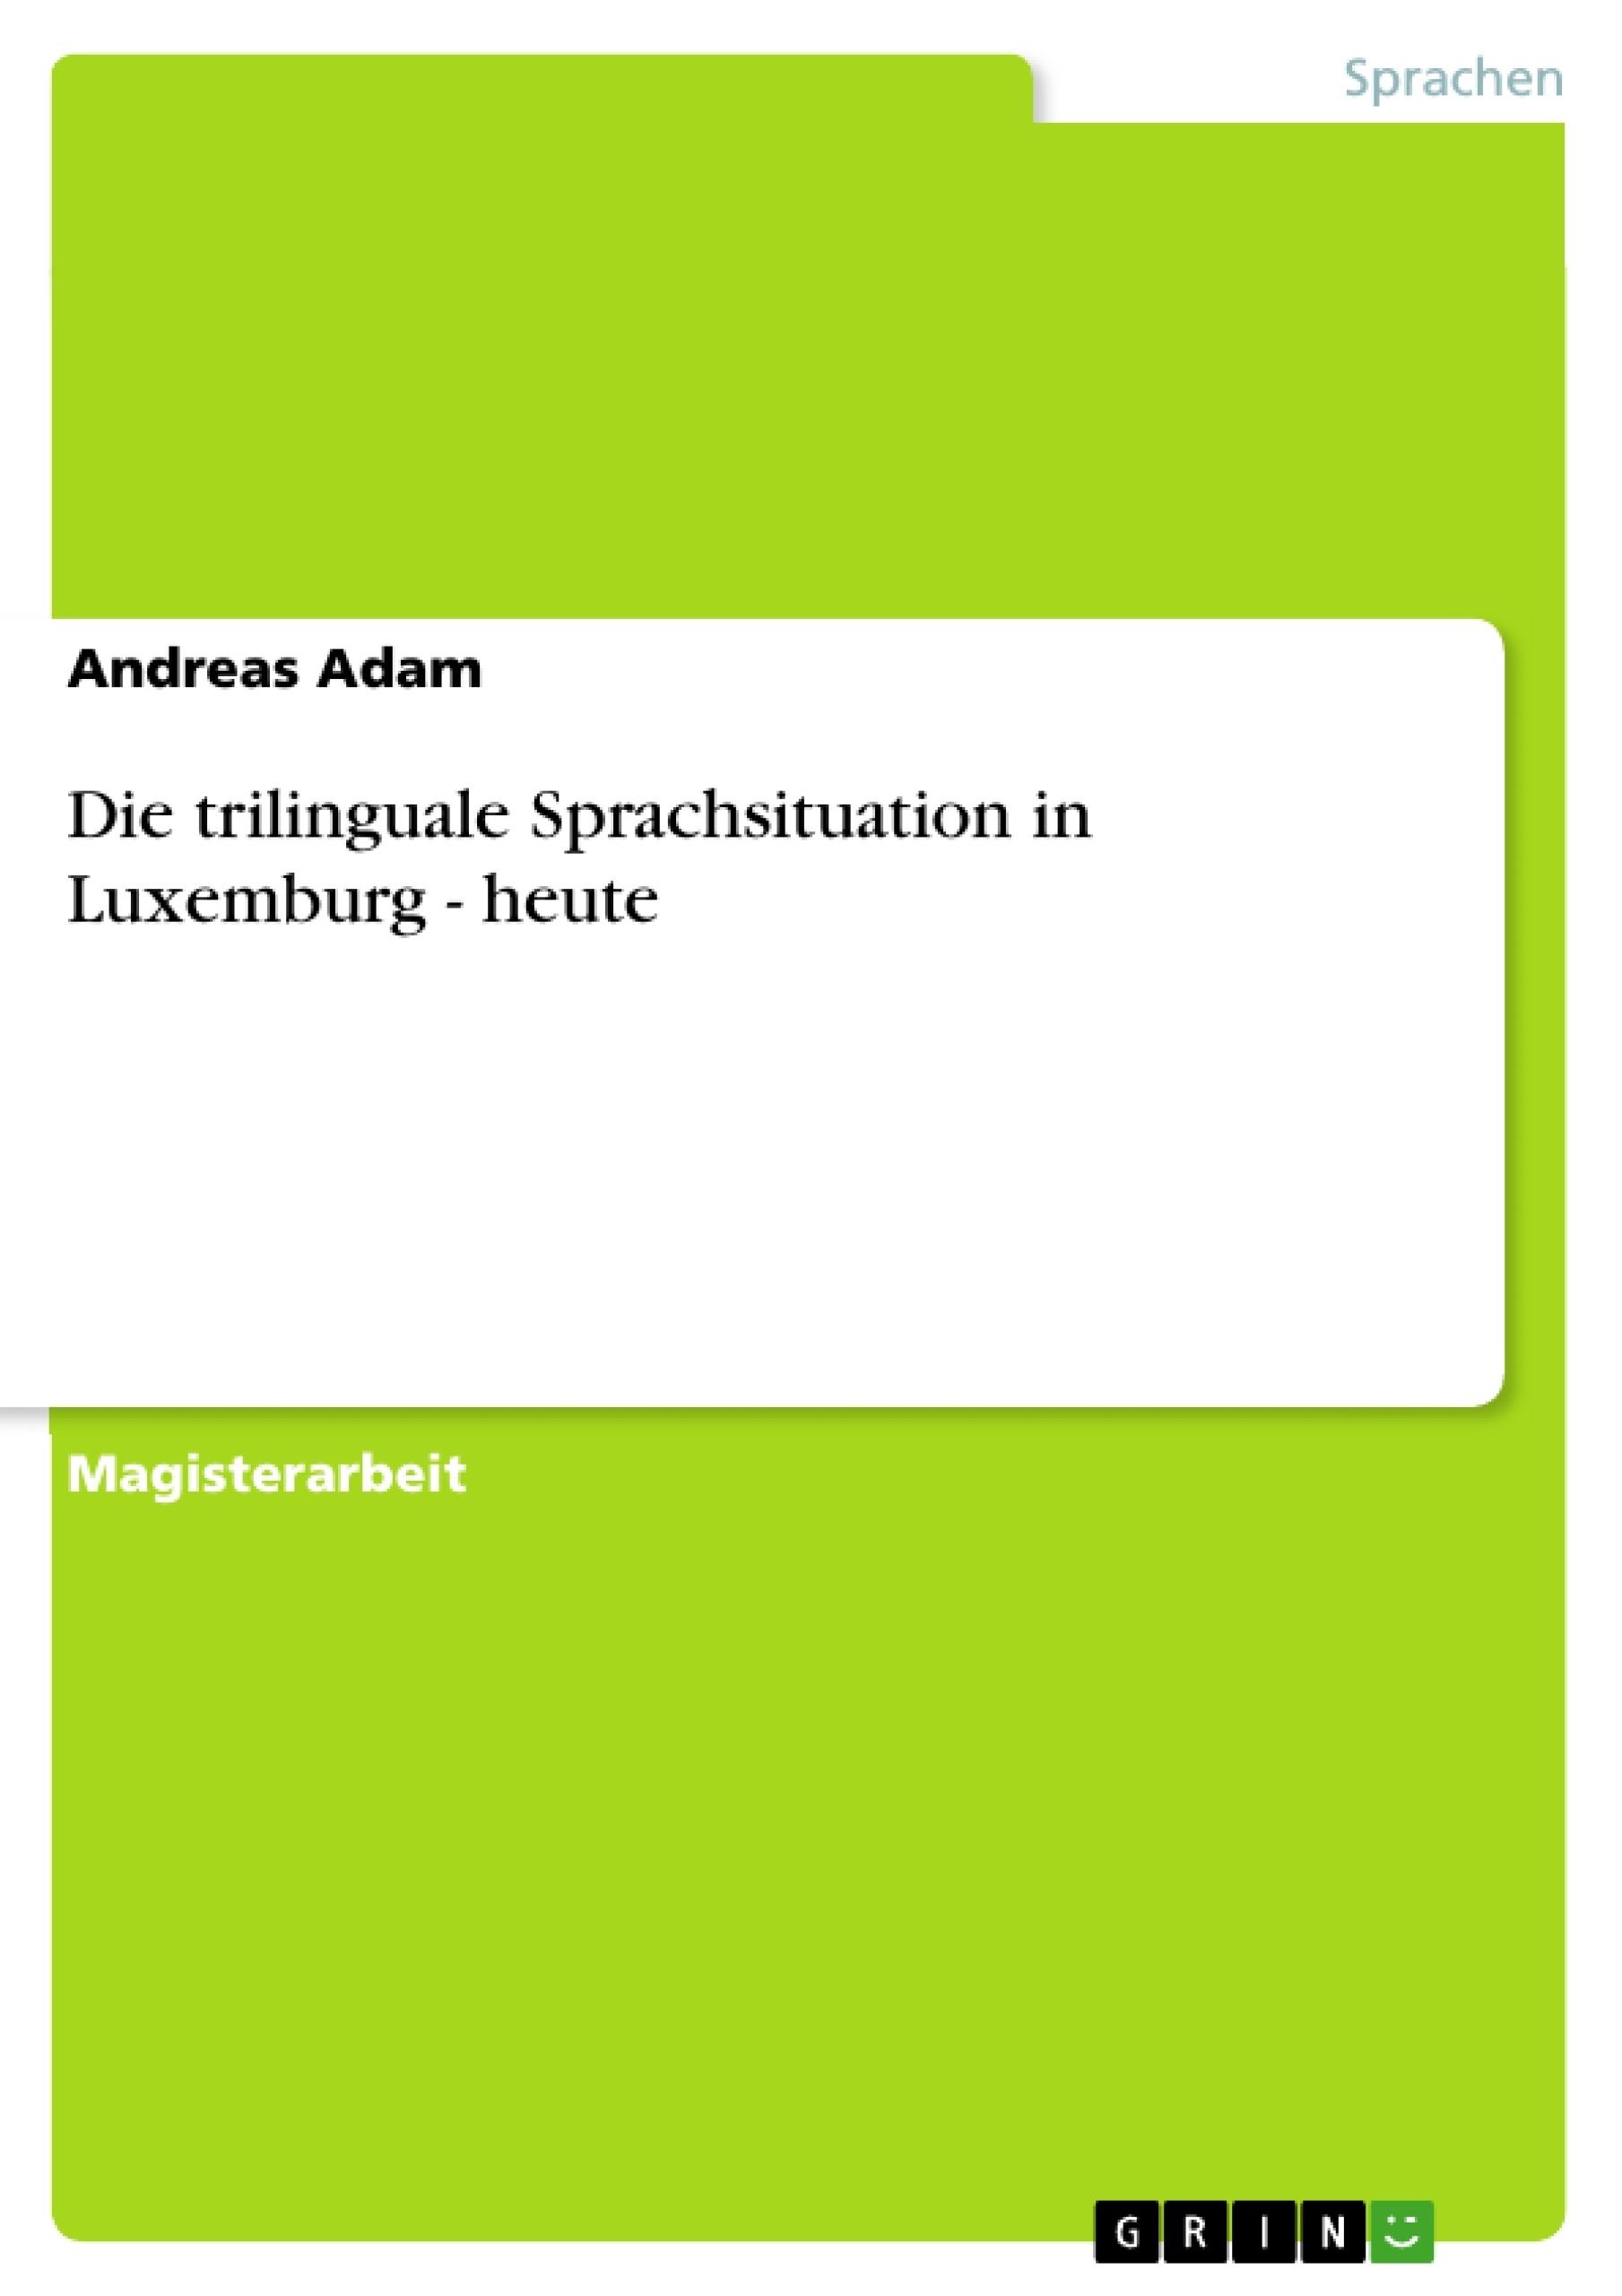 Titel: Die trilinguale Sprachsituation in Luxemburg - heute